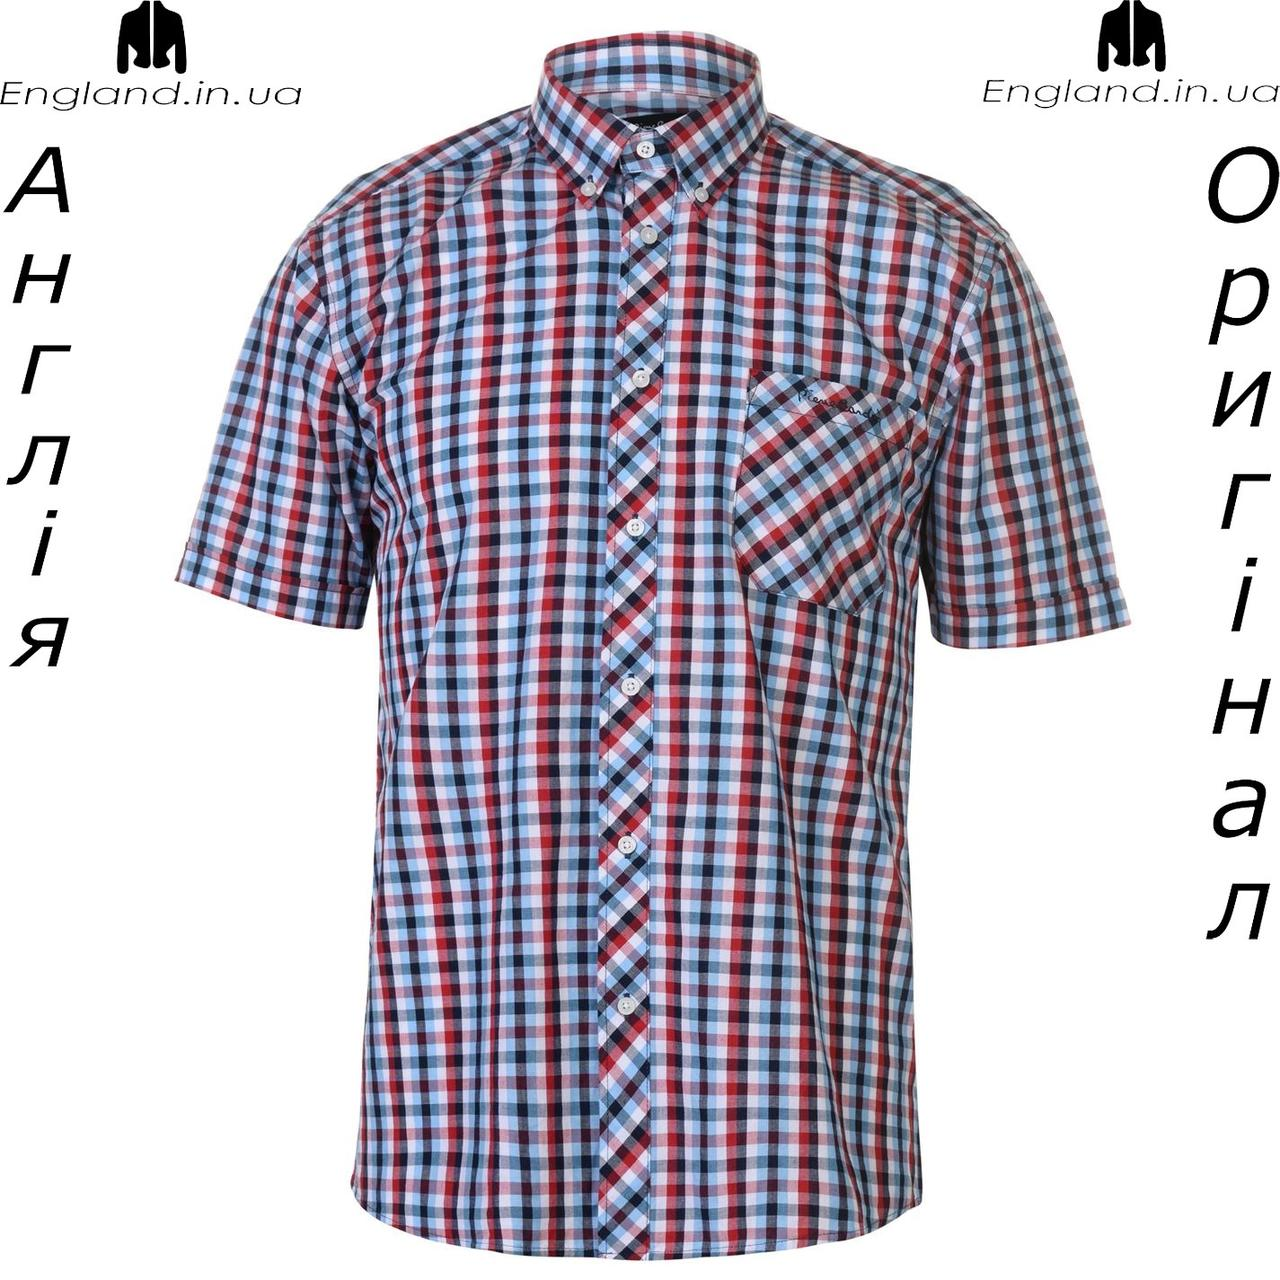 a3c7ebcf7f1 Рубашка в клетку мужская Pierre Cardin из Англии - на короткий рукав -  Интернет-магазин